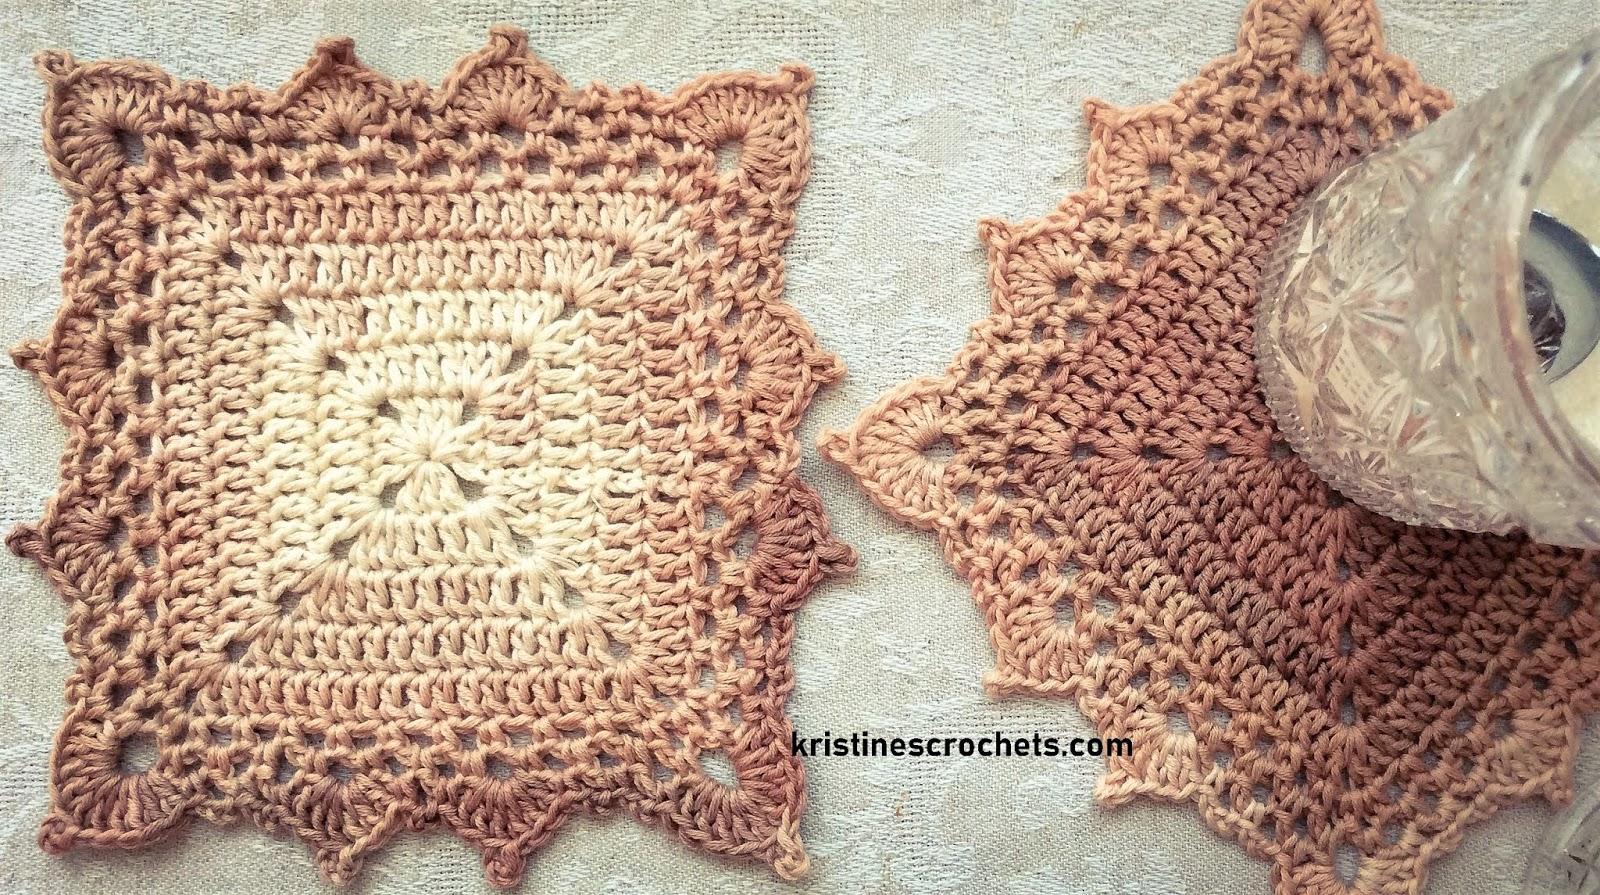 image regarding Free Printable Crochet Granny Square Patterns titled KristinesCrochets : Crochet Granny Sq. Coaster Absolutely free Habit